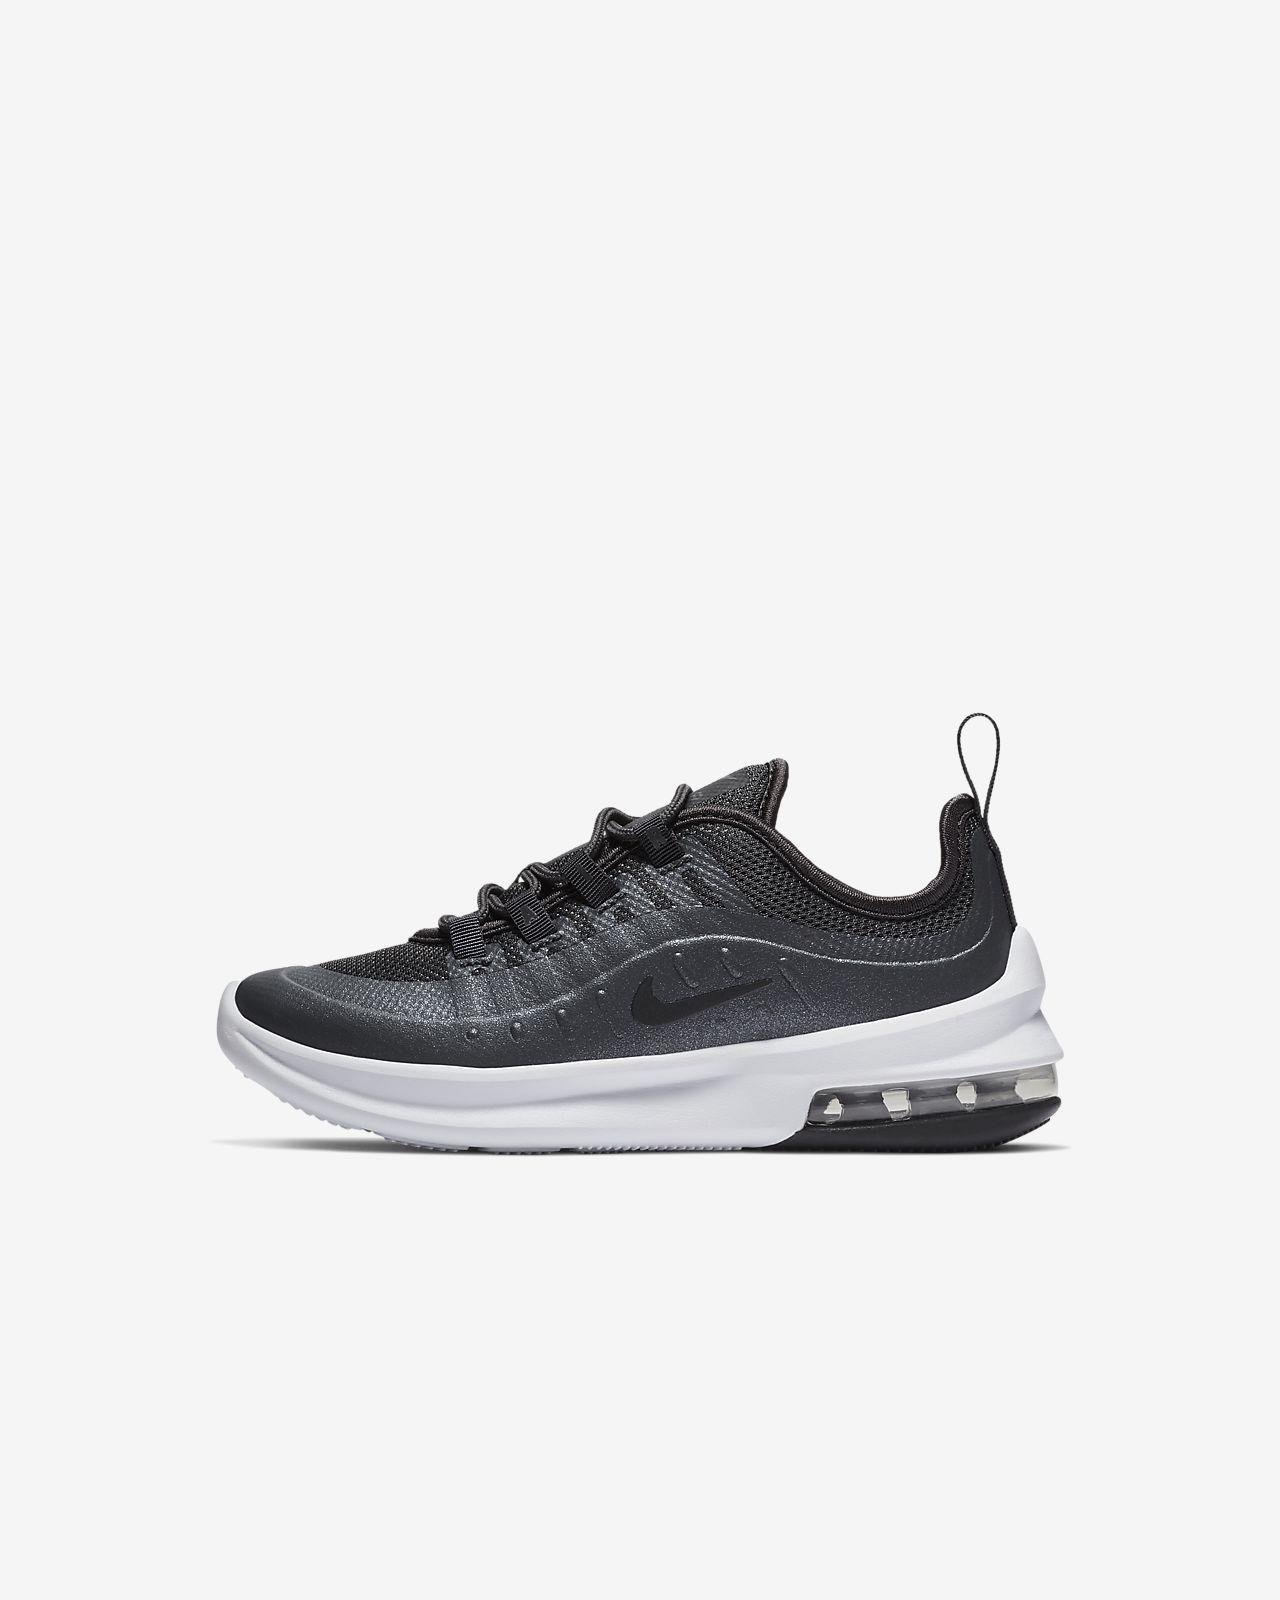 buy online 29788 8a278 Se Axis Barn Air Nike Små För Max Sko Sqg1fwOUW